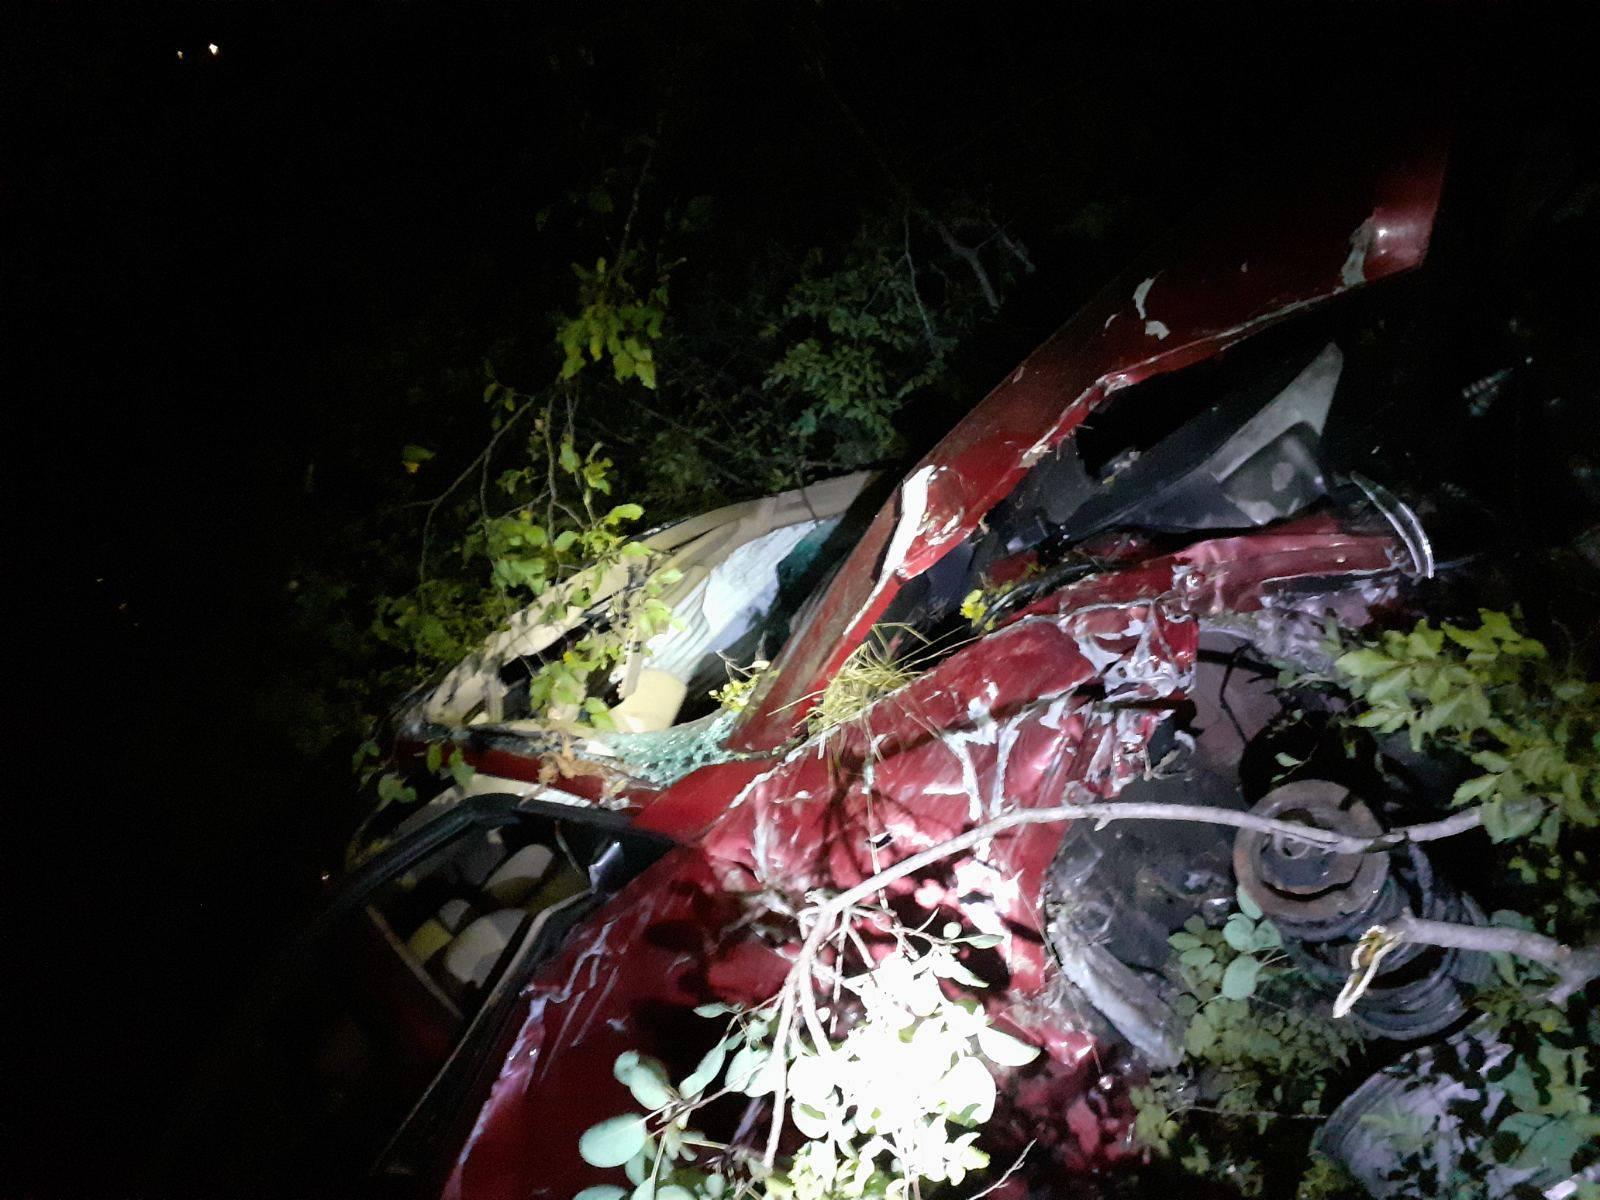 Detalji strave kod Knina: Mladić u BMW-u probio ogradu i sletio u provaliju duboku 16 metara